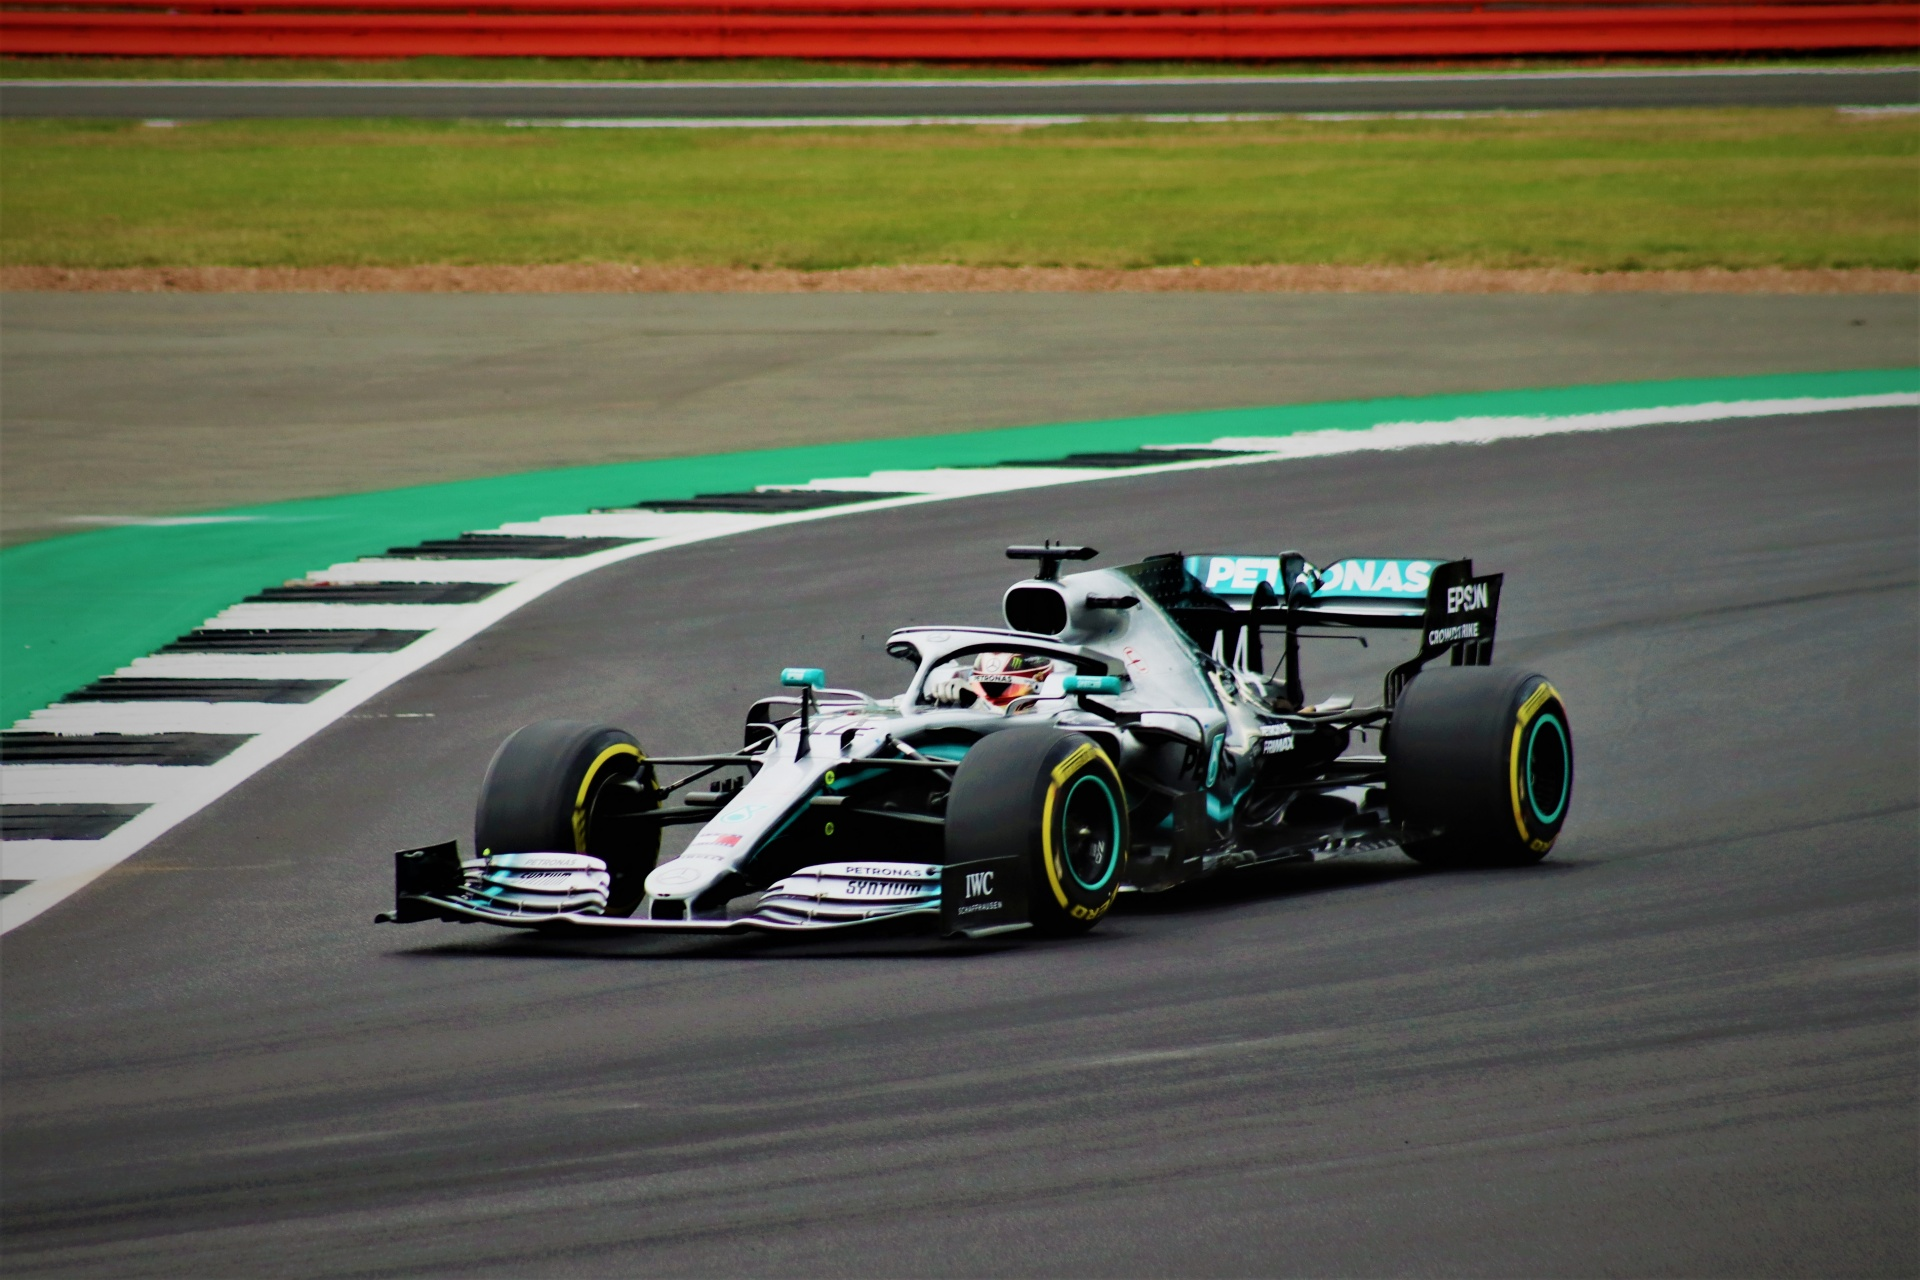 Vijfdaagse vliegreis – Grand Prix Engeland – F1 Silverstone 2022